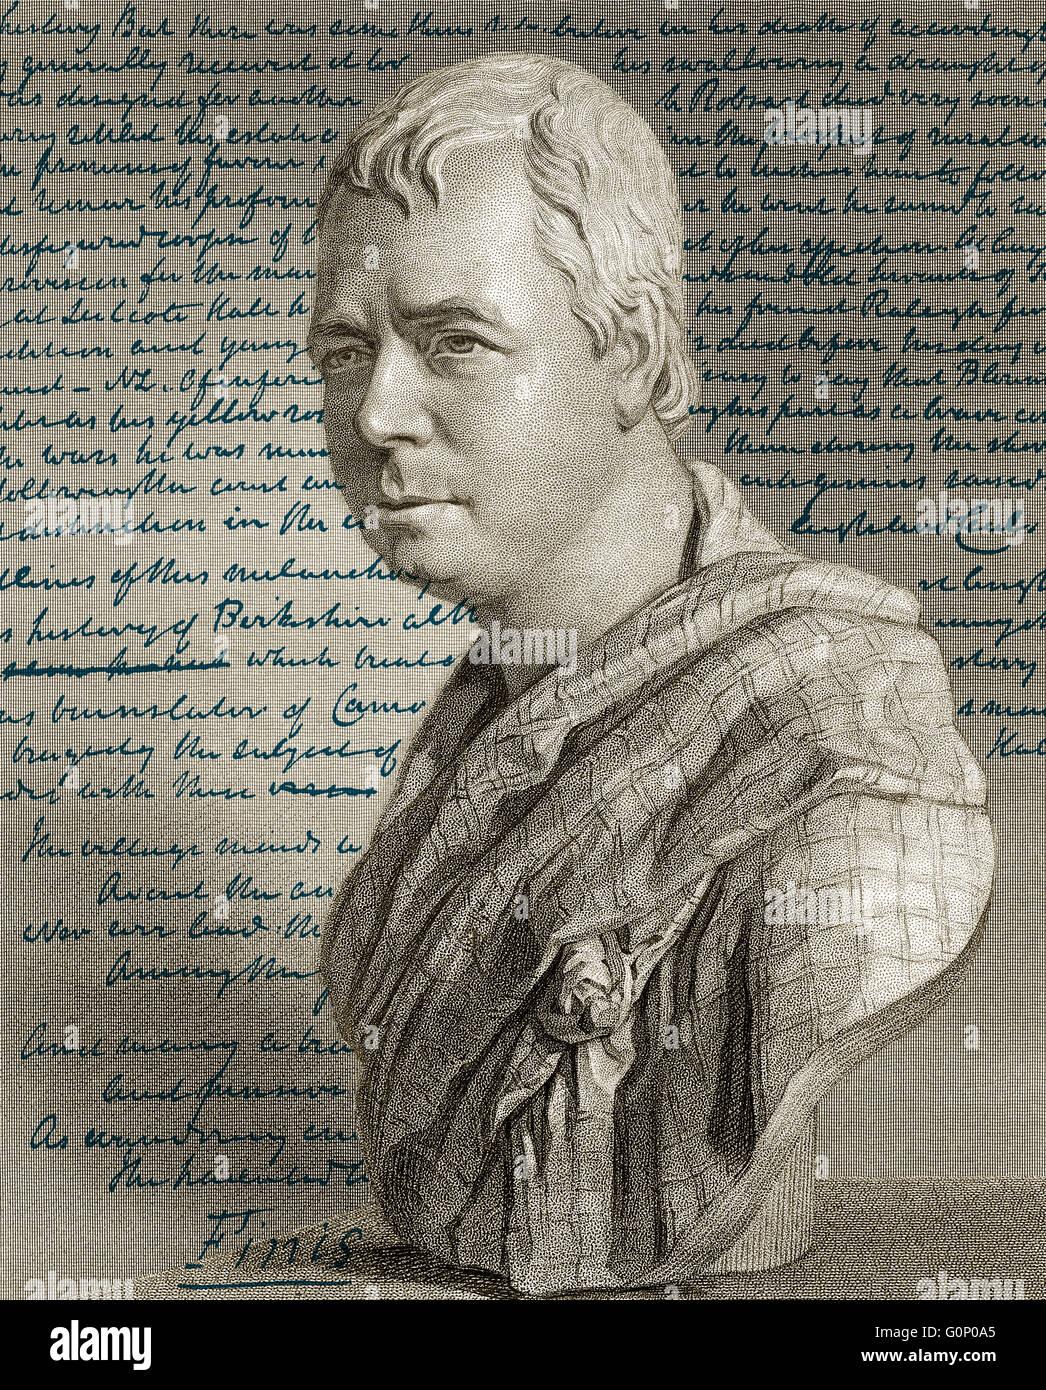 Portrait and manuscript of the novel Kenilworth by Sir Walter Scott, 1st Baronet of Abbotsford, 1771 - 1832, Scottish Stock Photo